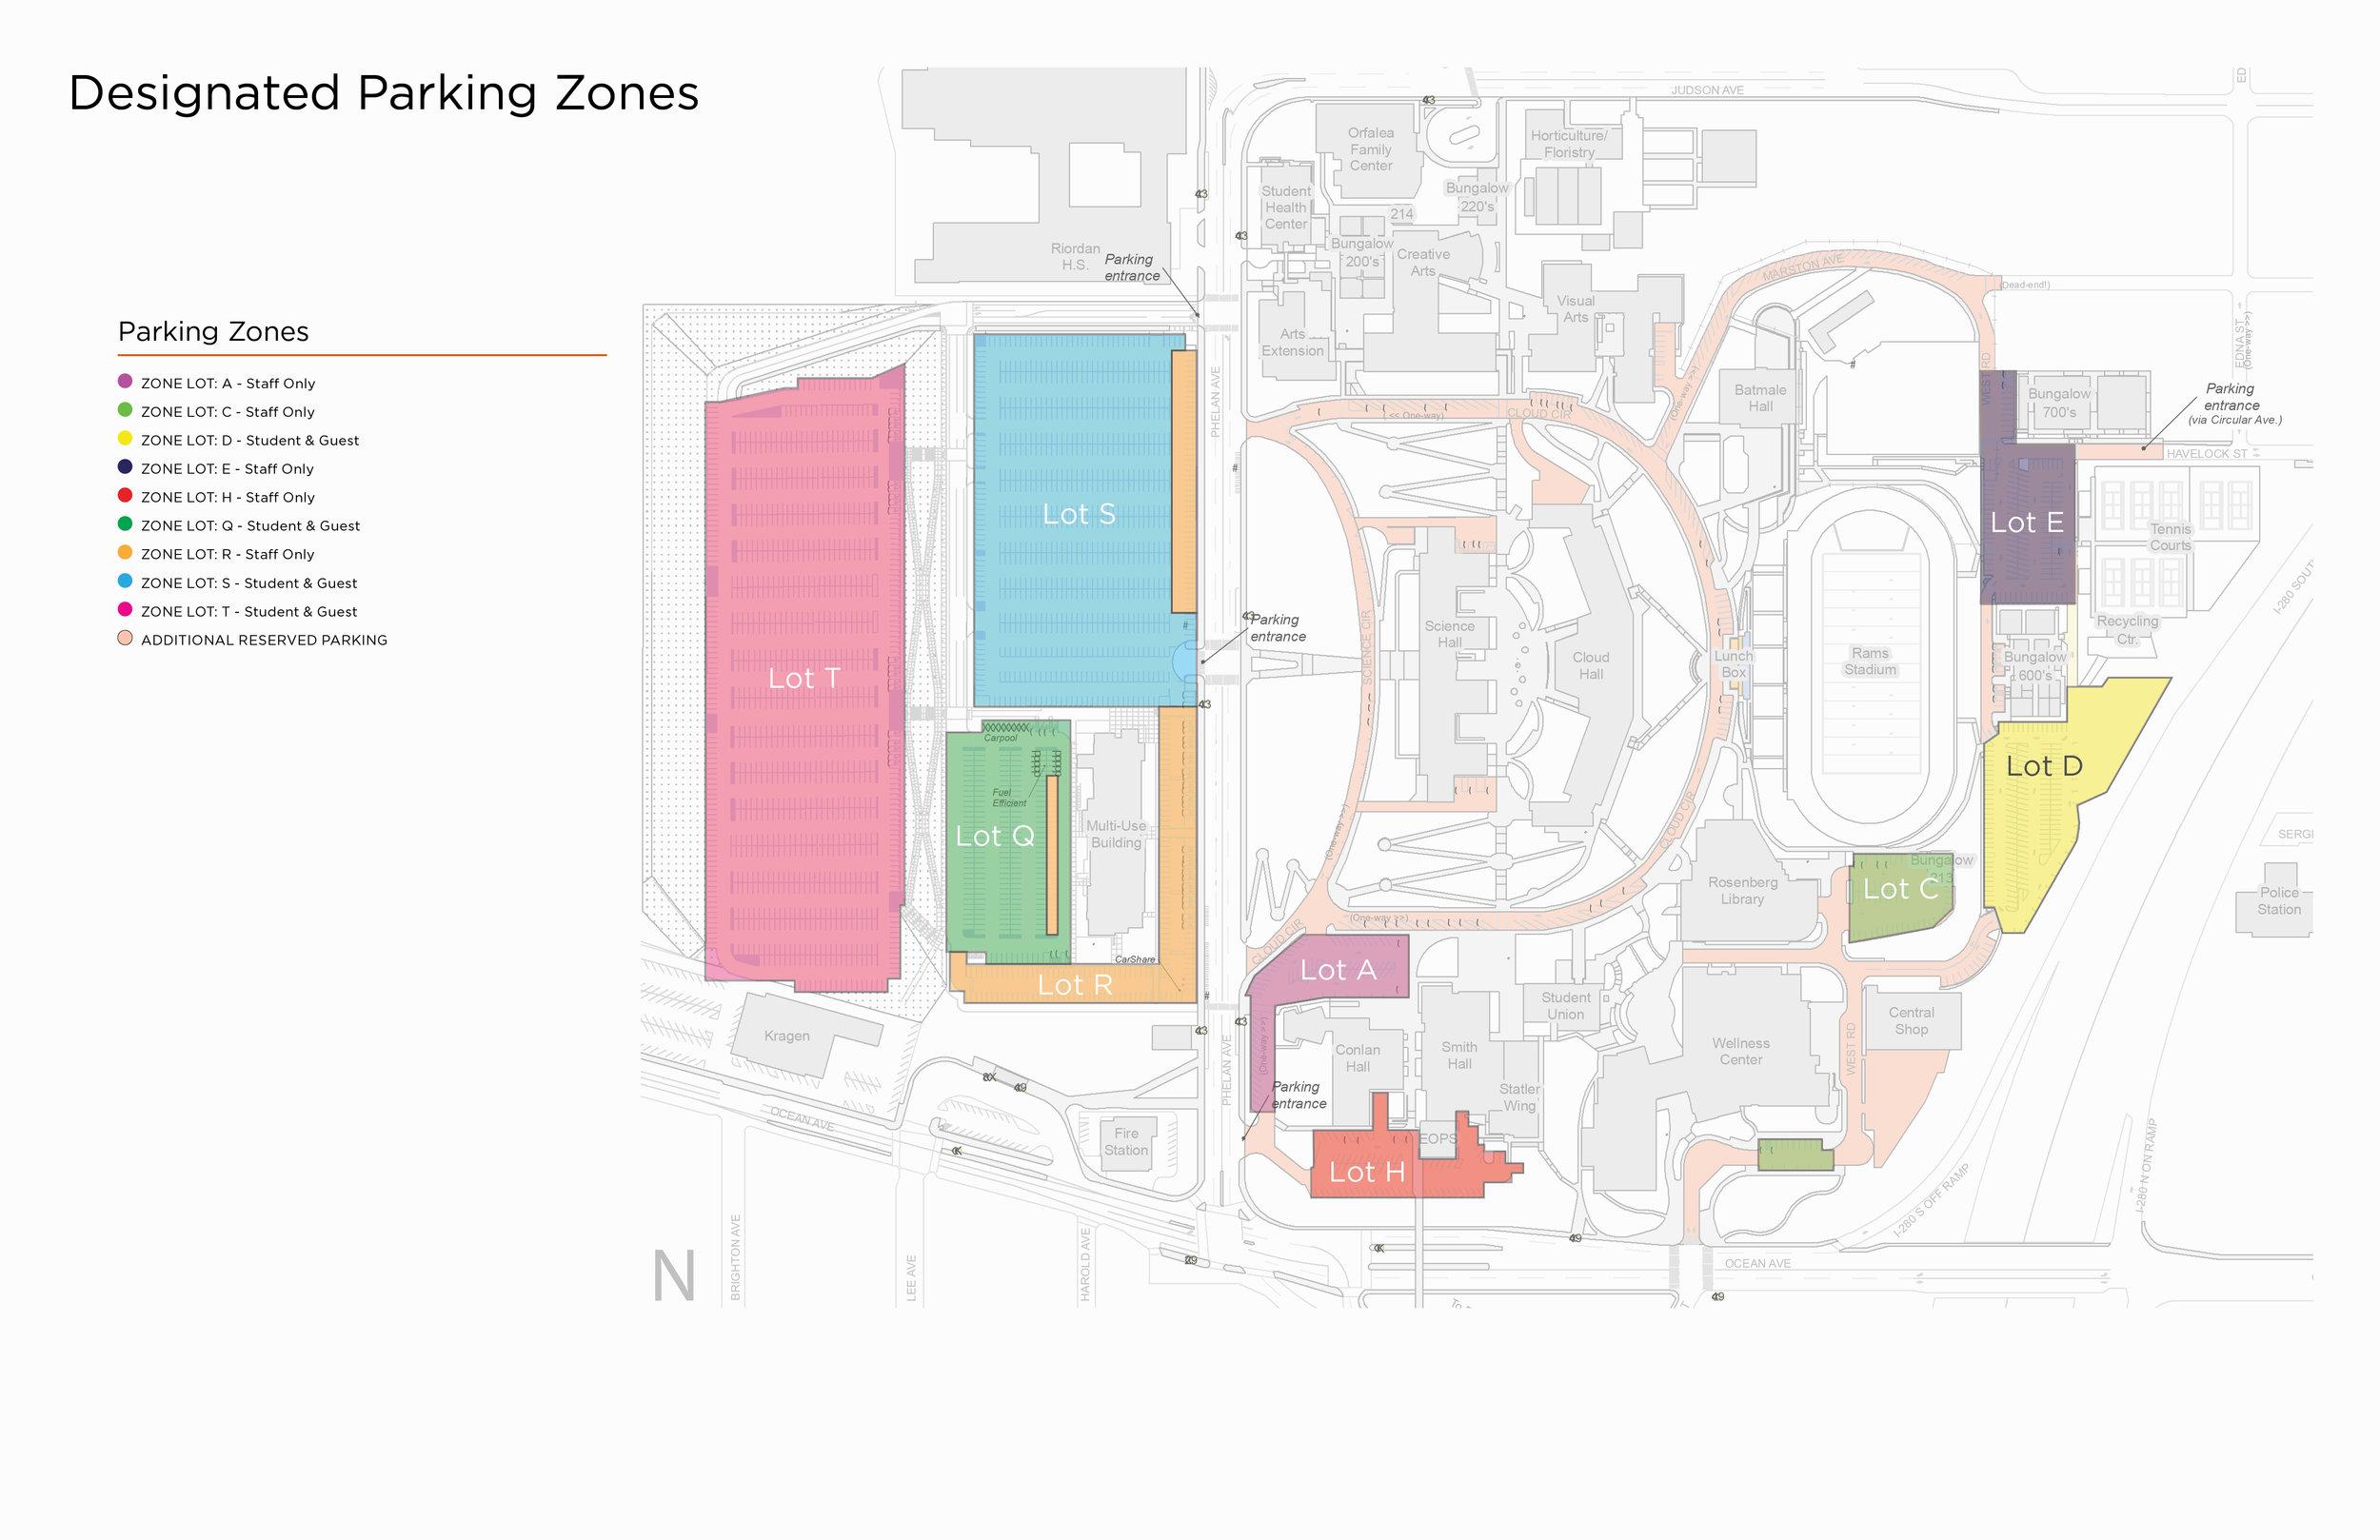 CCSF_ParkingLot_2017_013112.jpg